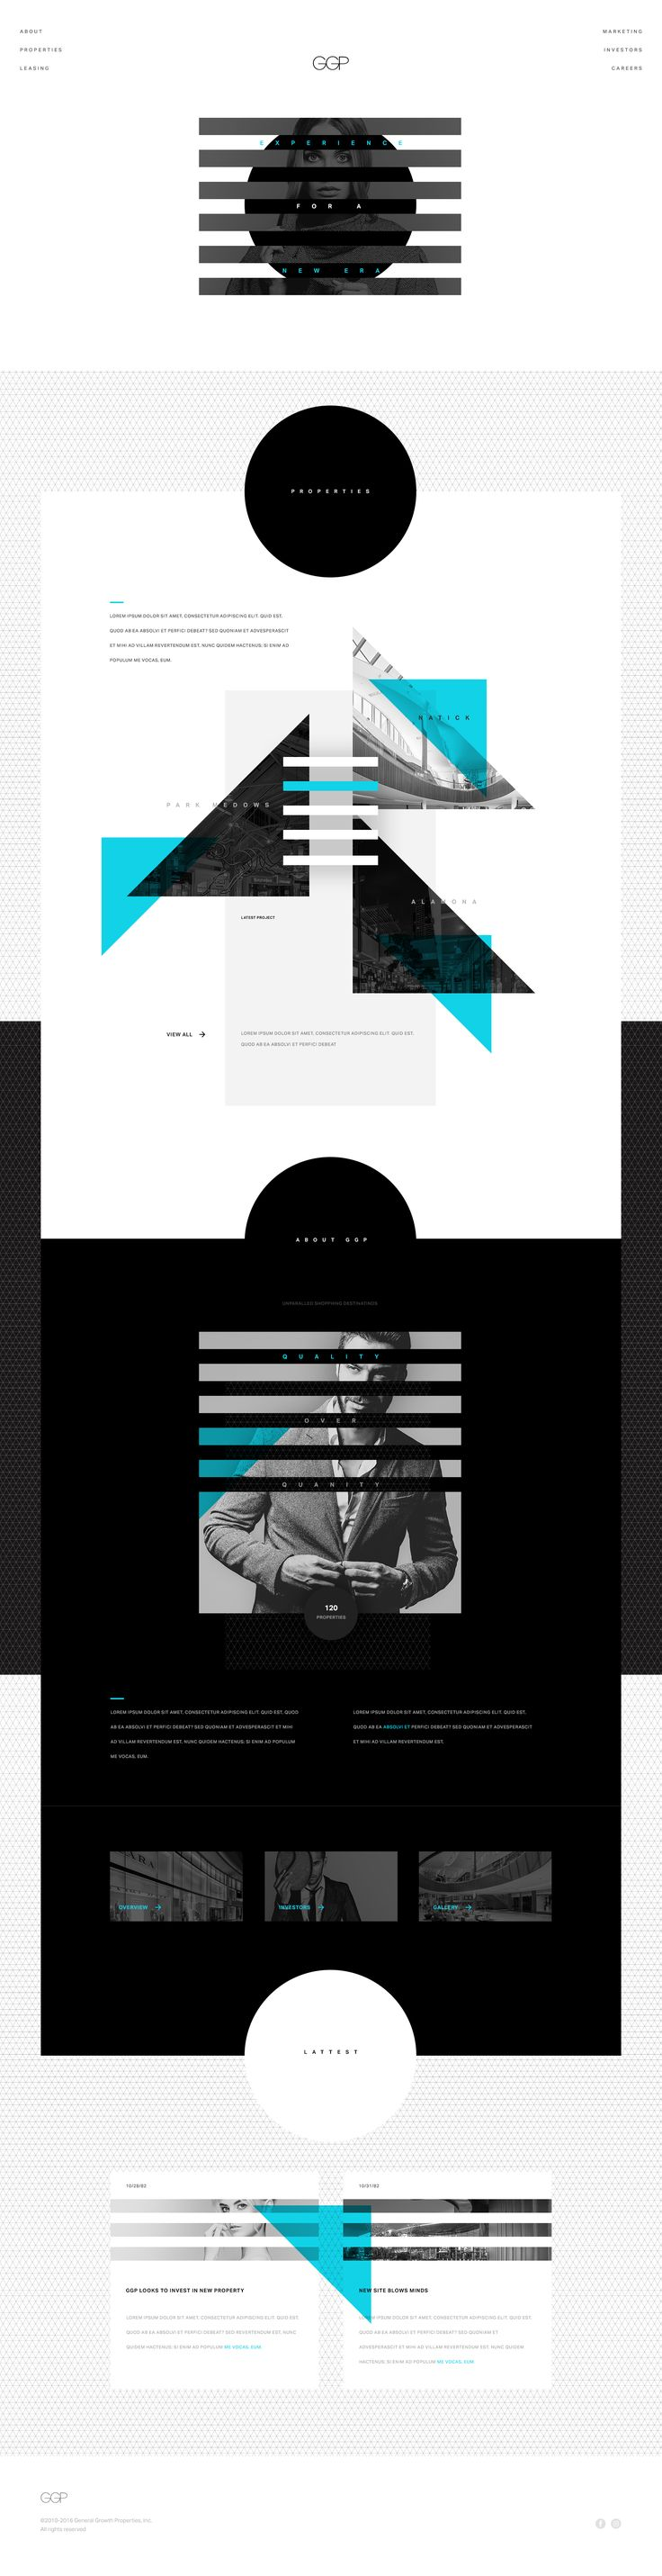 U design concept unused for fashion store, by Elegant Seagulls.